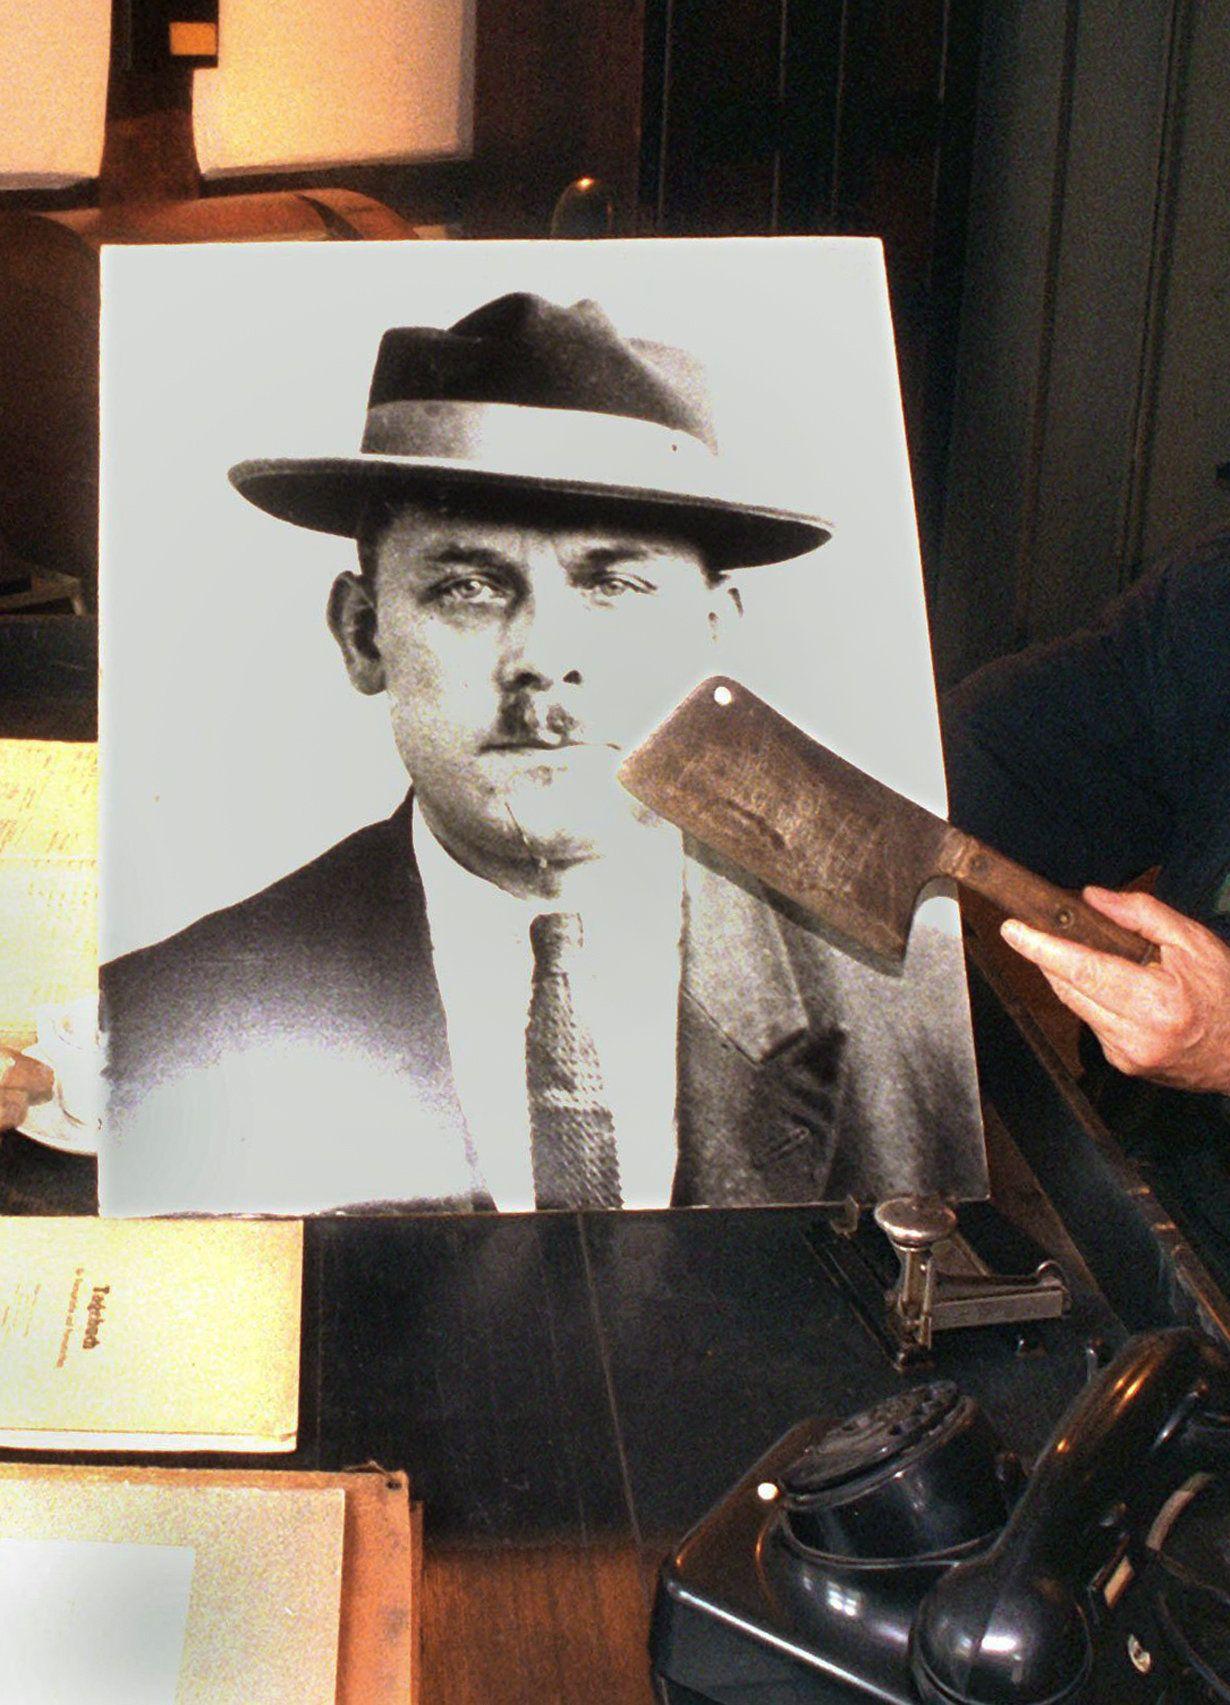 Serienmörder Fritz Haarmann